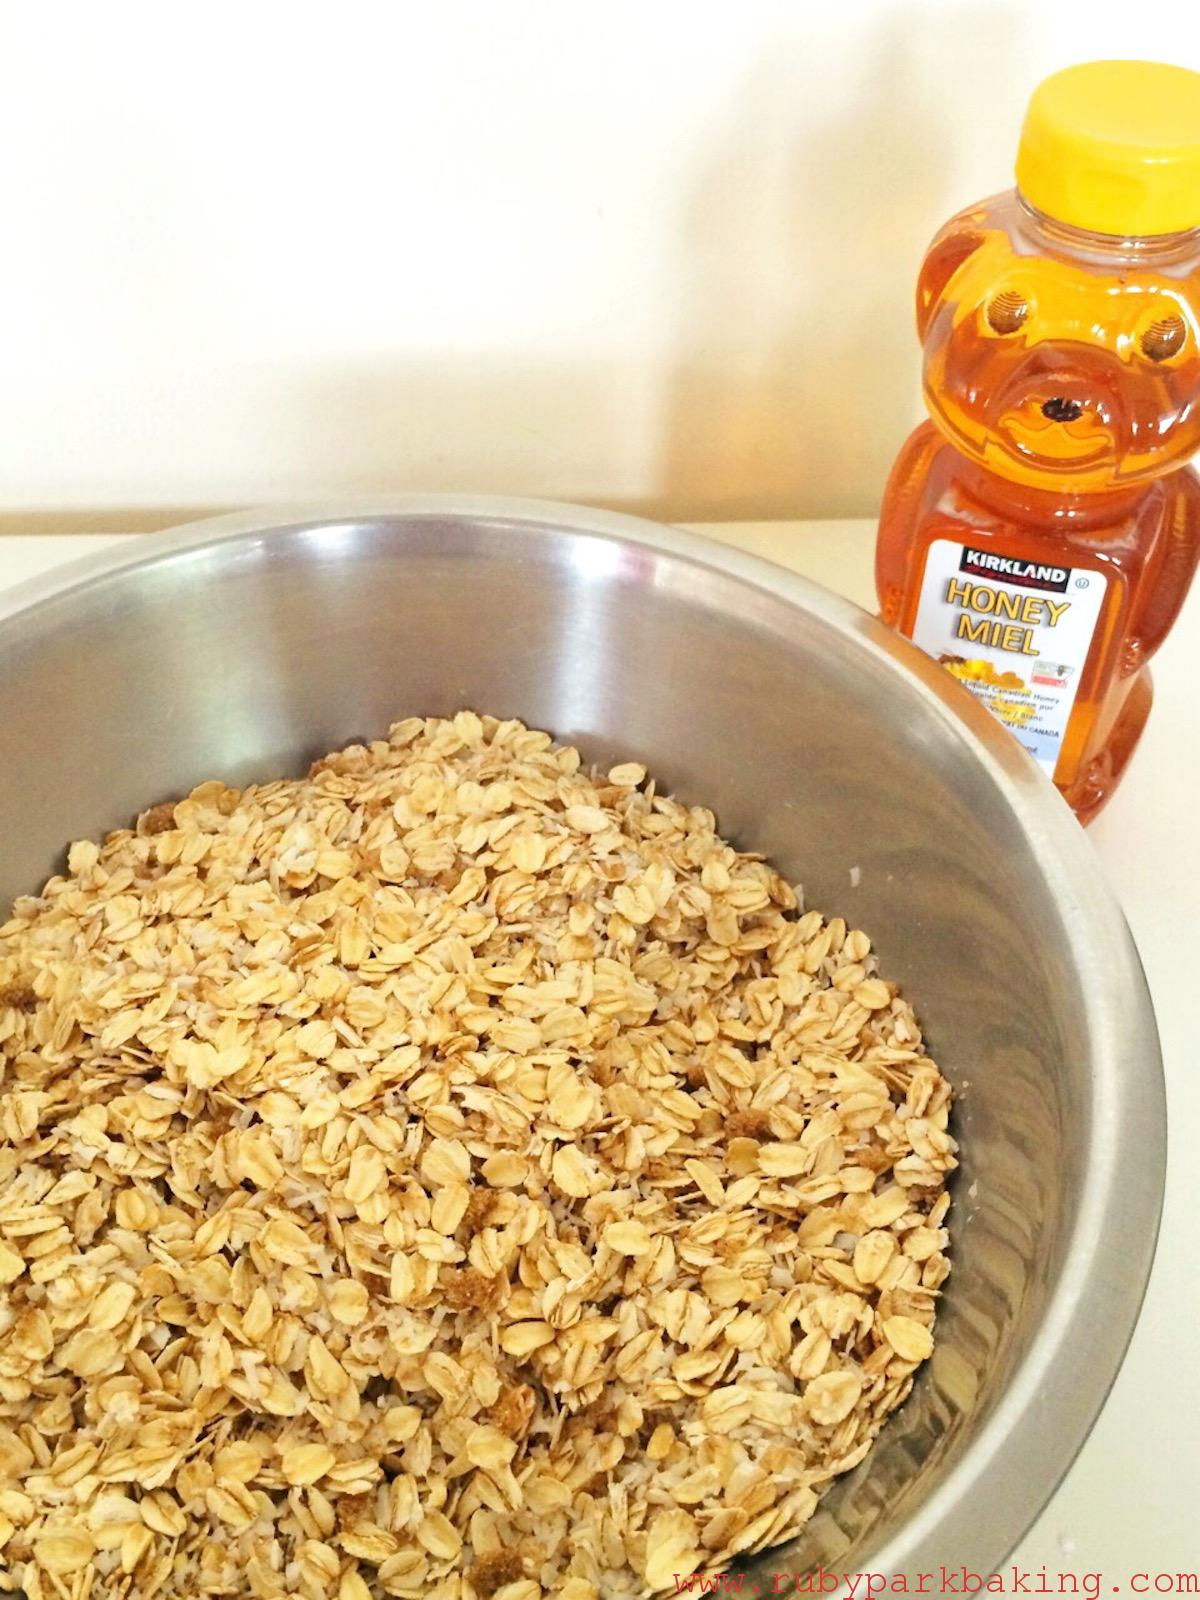 Coconut Honey Granola on rubyparkbaking.com